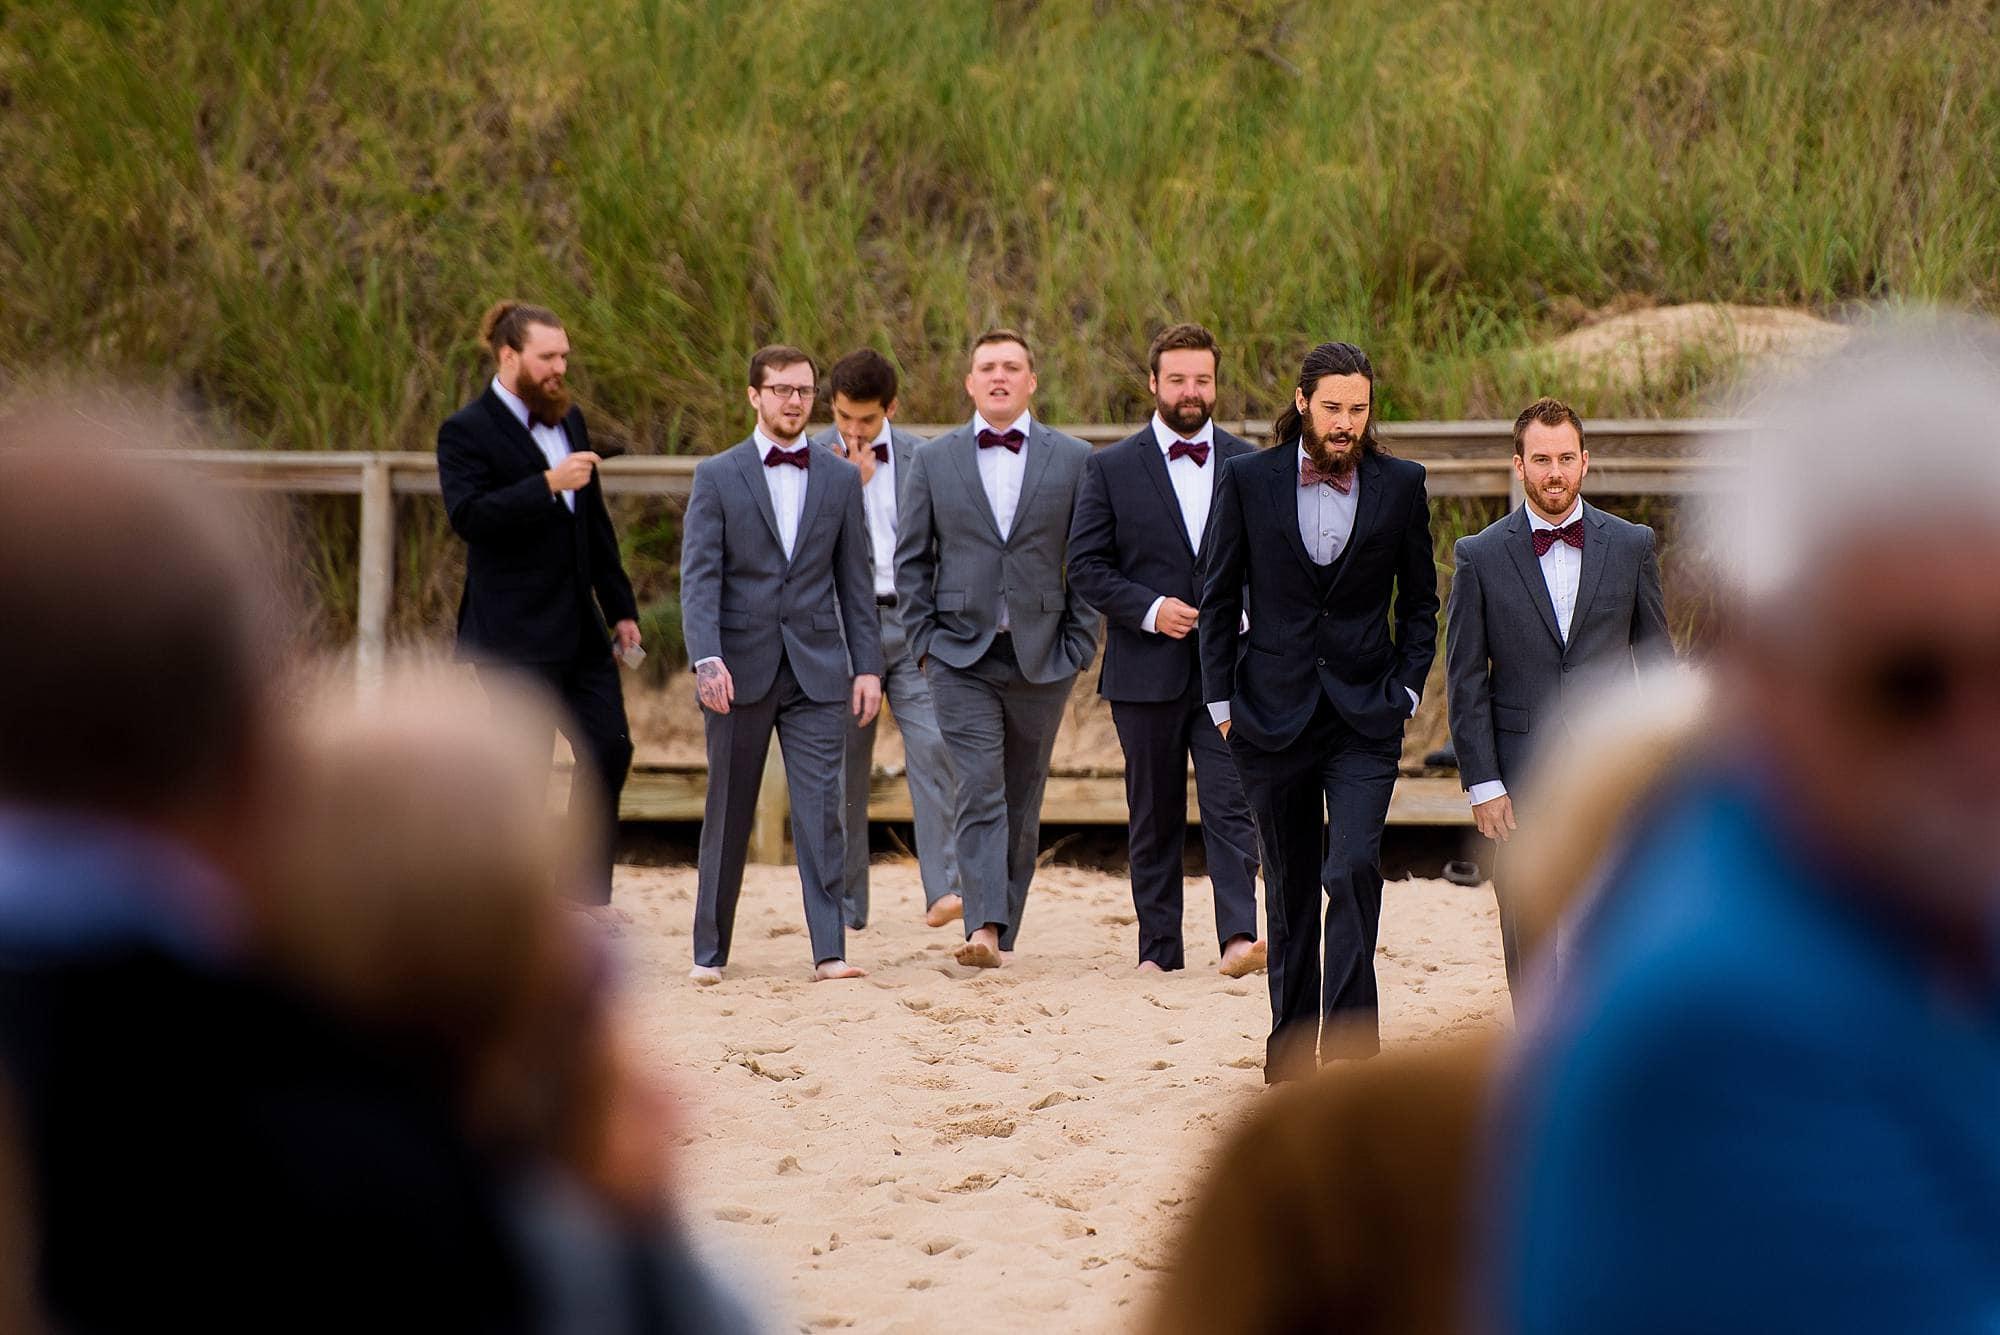 groomsmen walking to ceremony